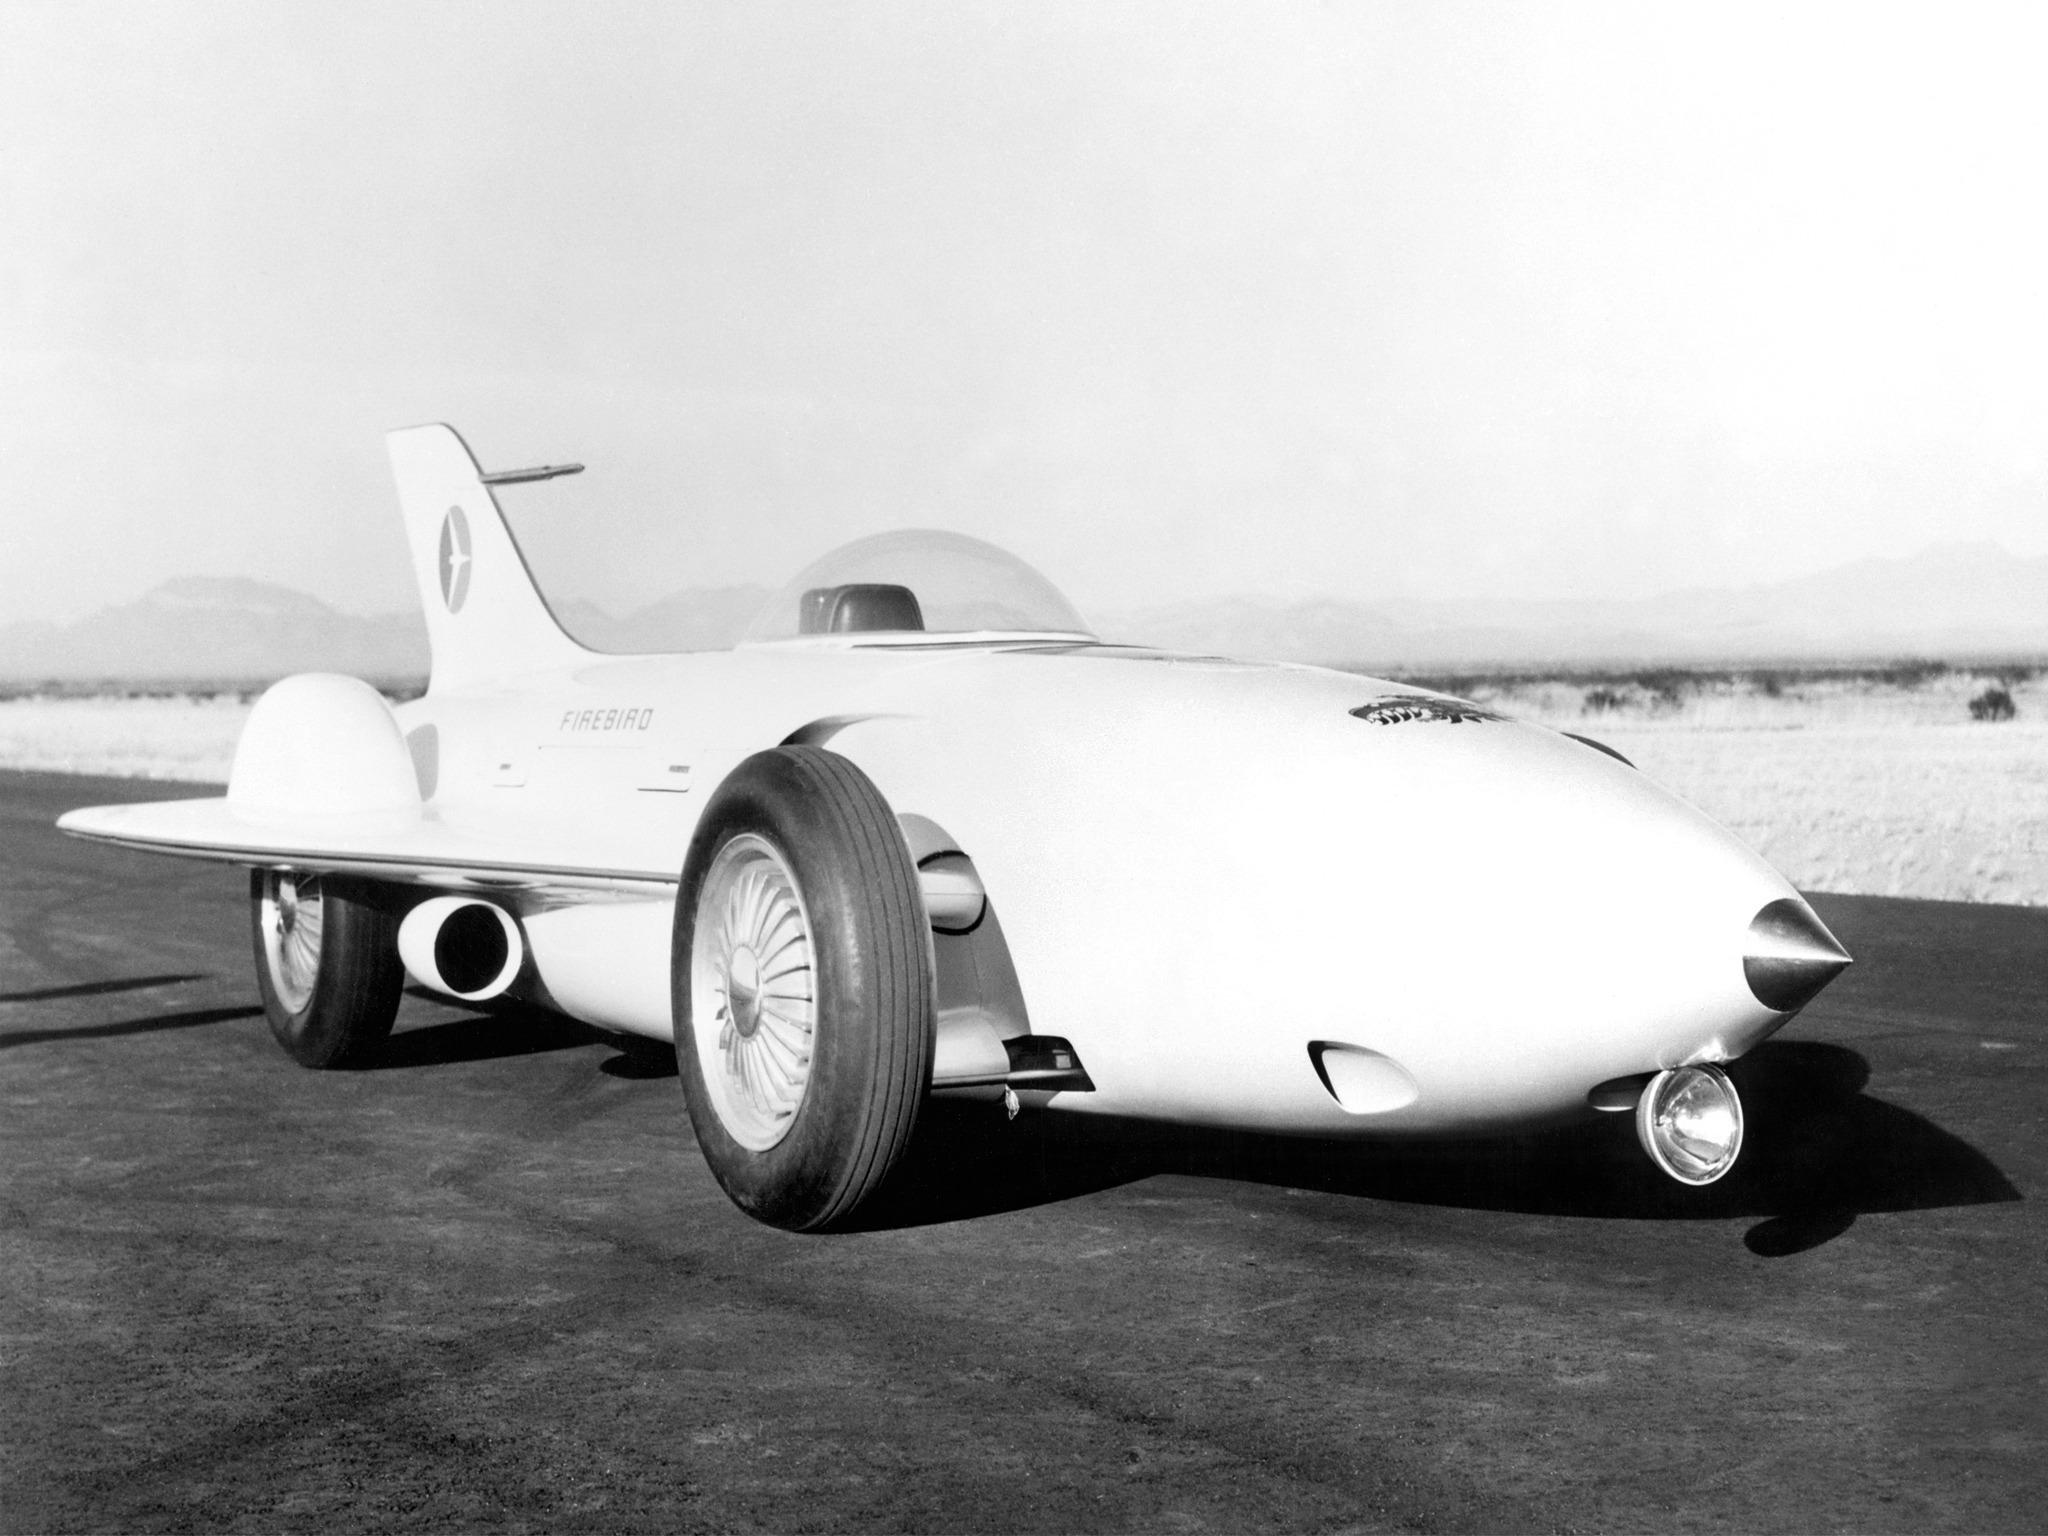 Gm Firebird I Concept Car 1953 Old Concept Cars